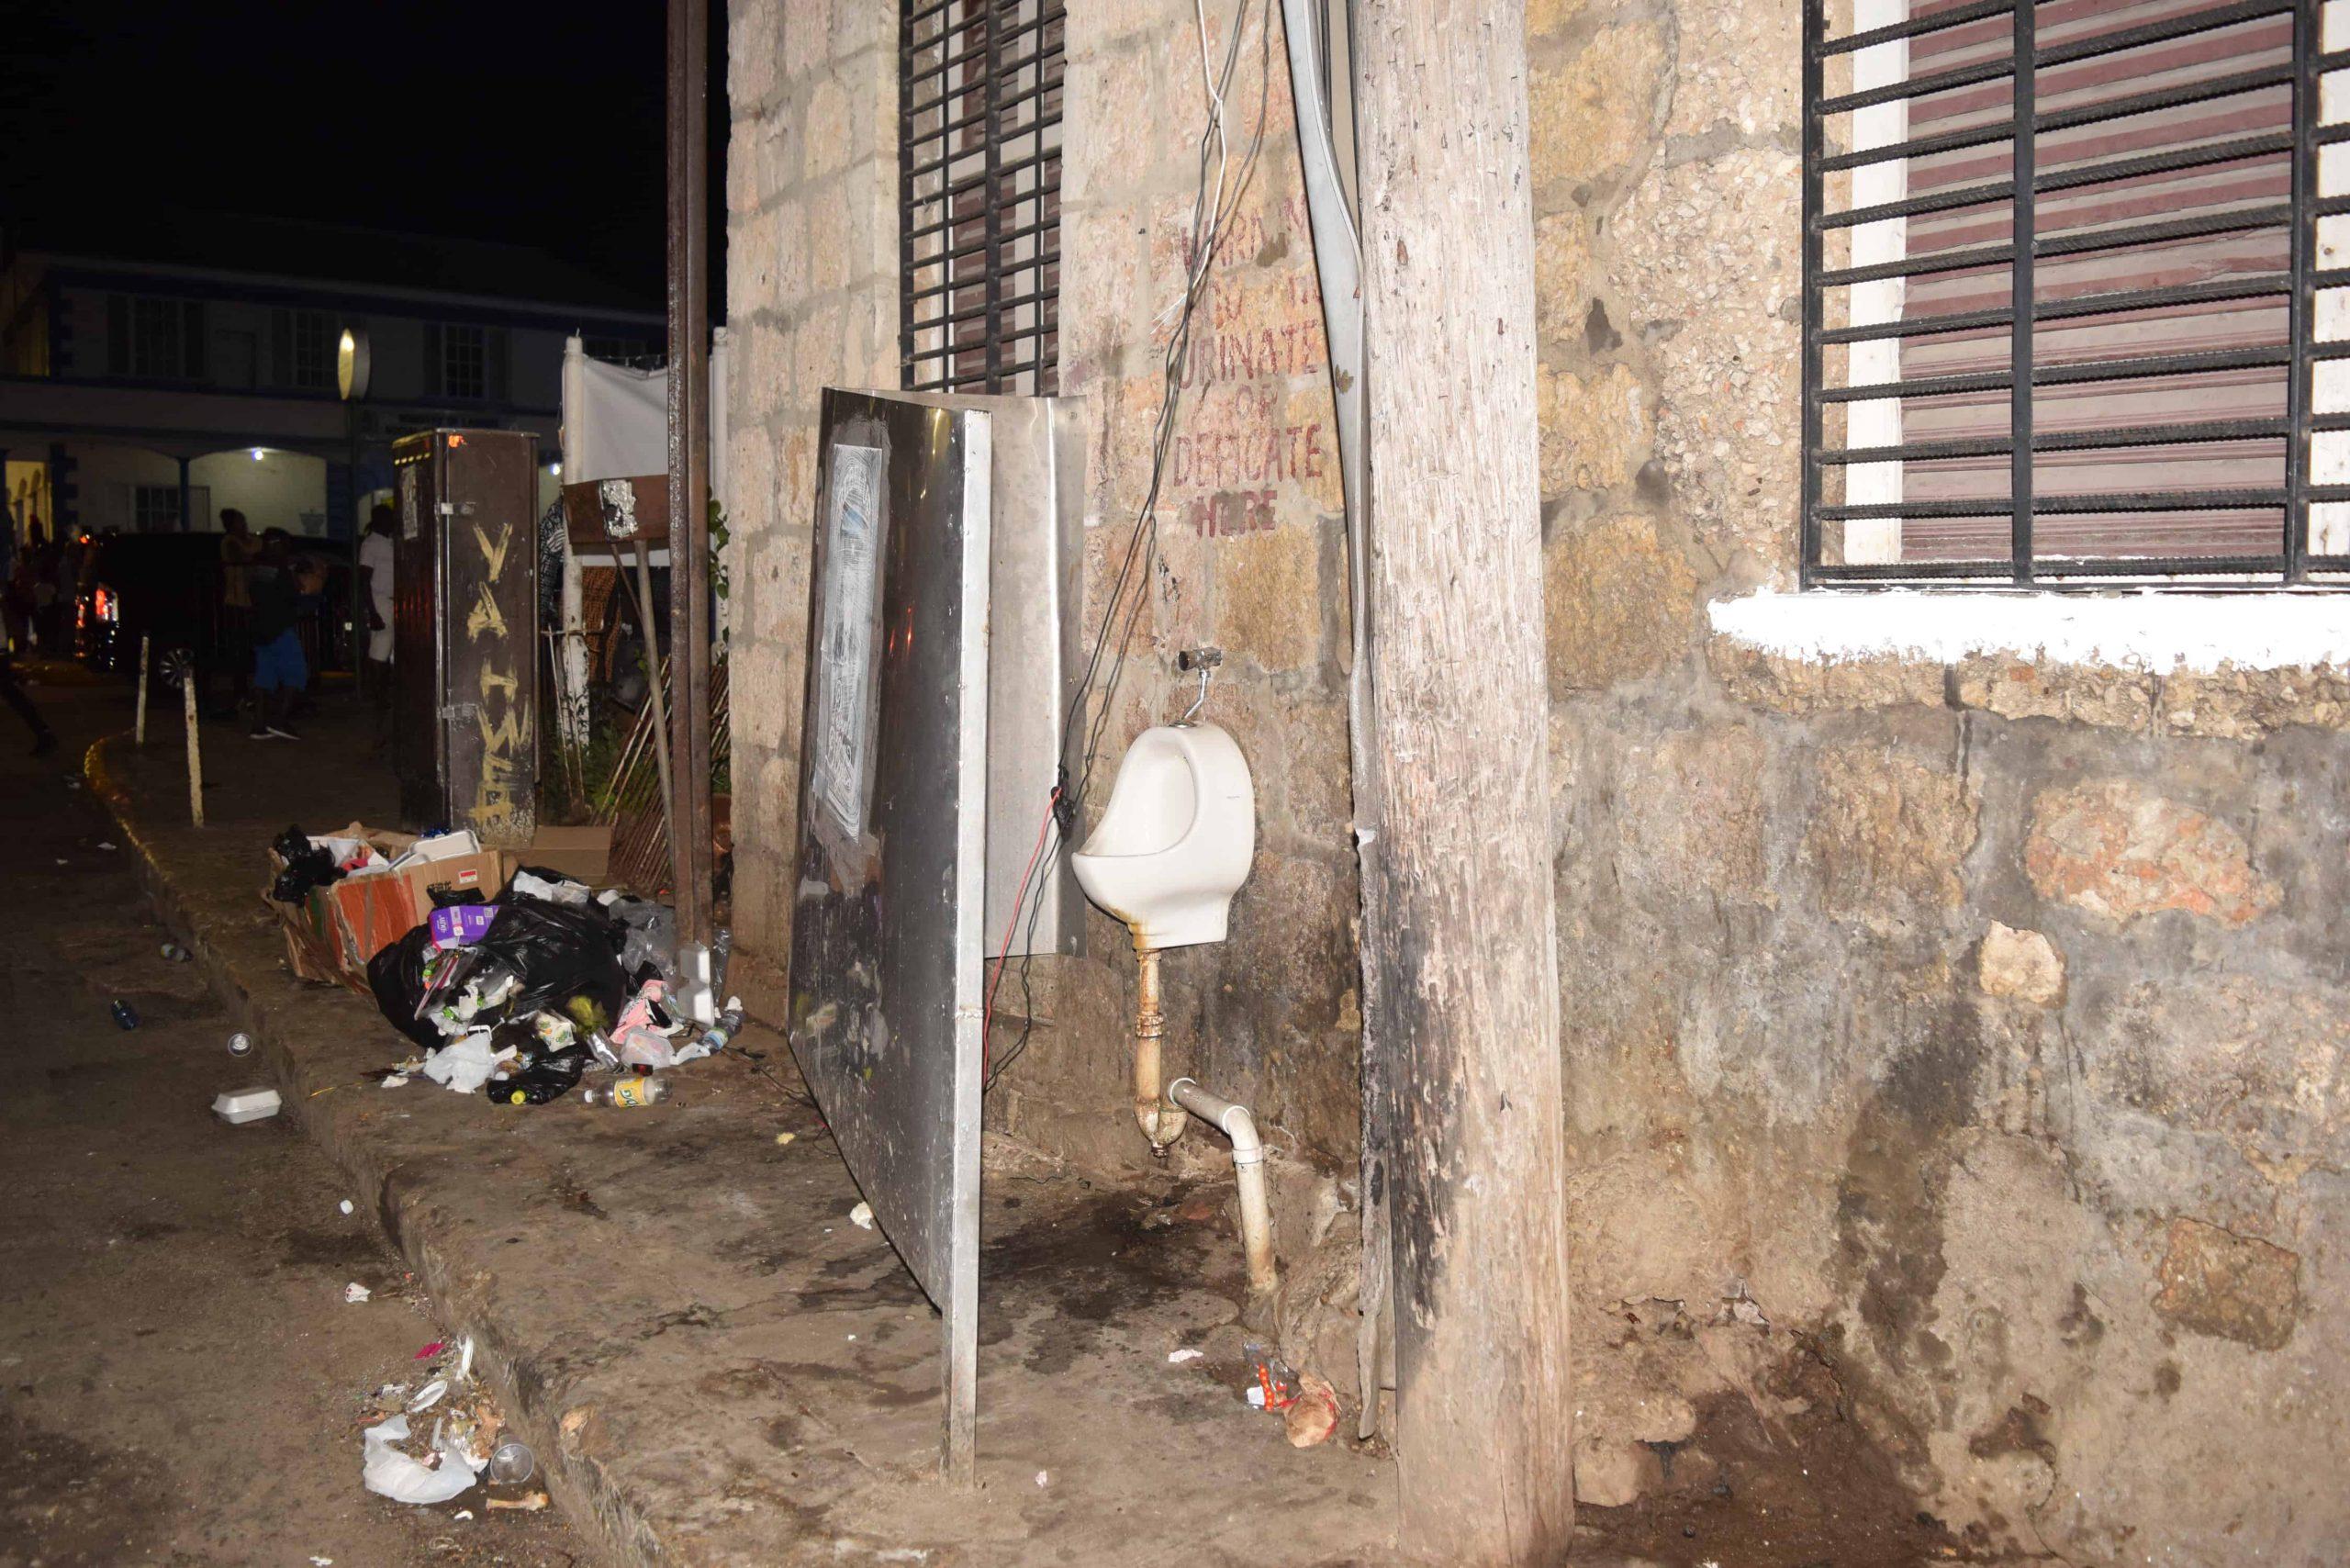 No Toilet at Christmas in Sam Sharpe Square